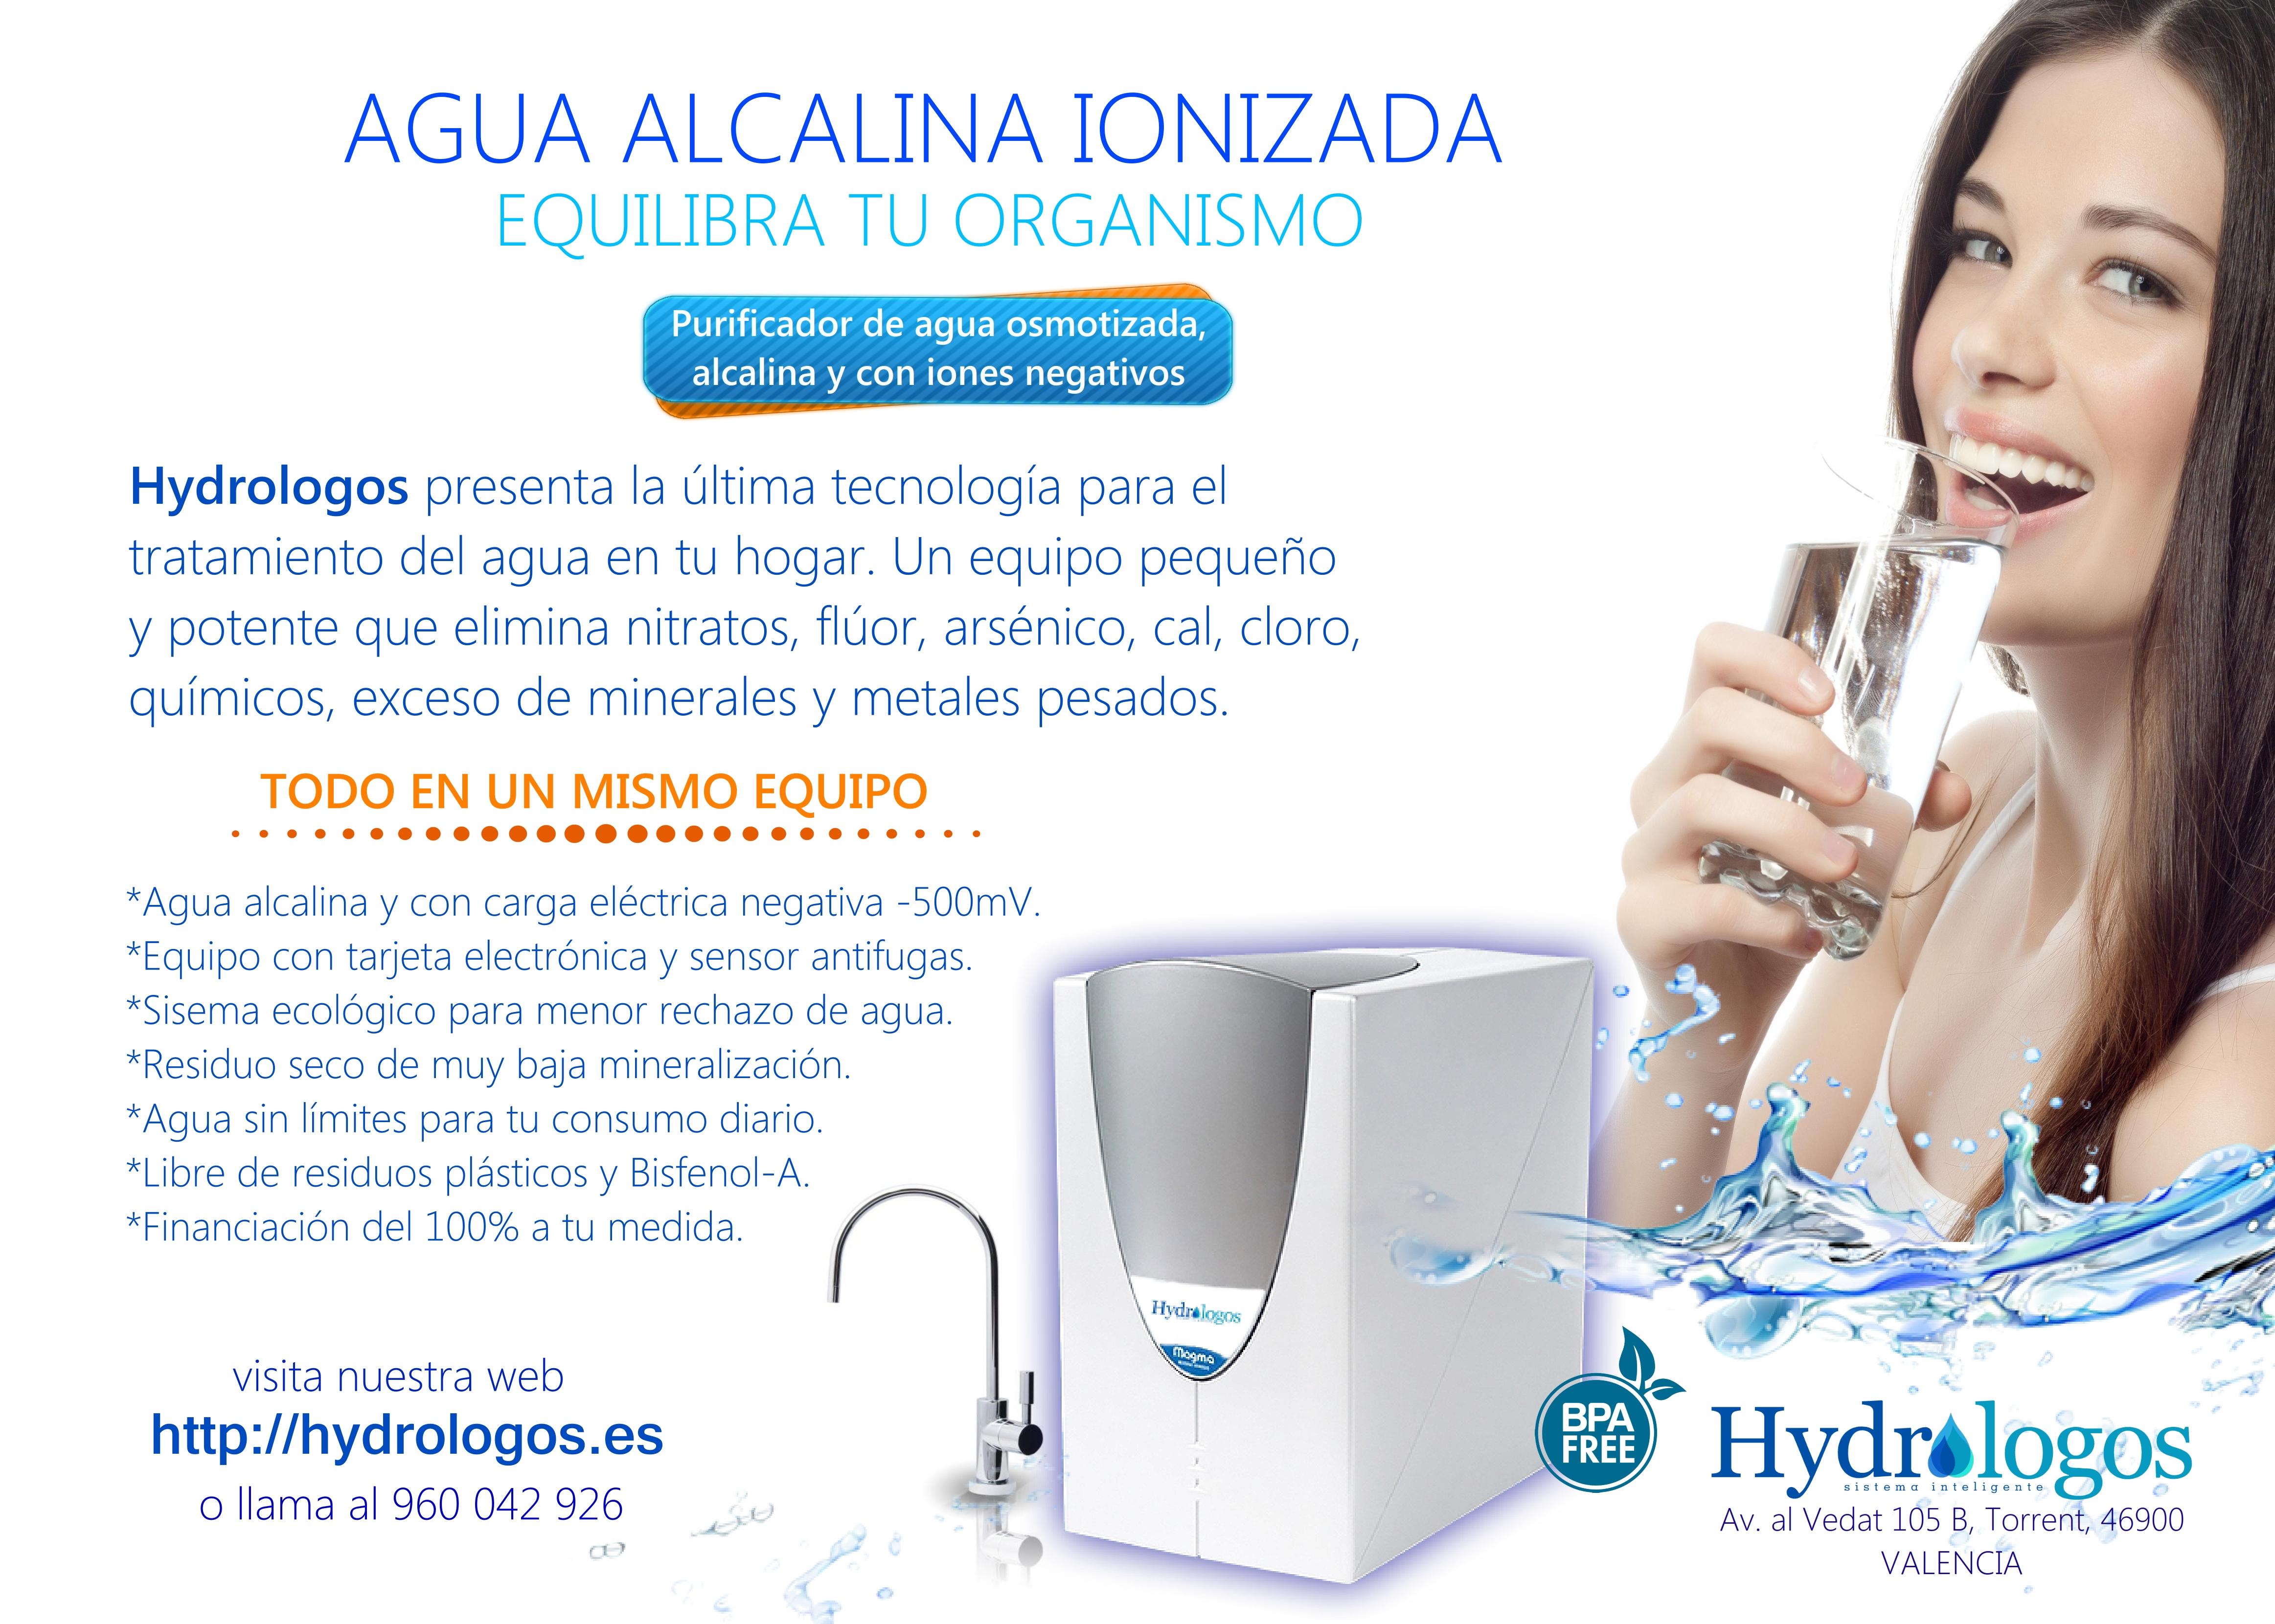 agua alcalina con carga eléctrica negativa